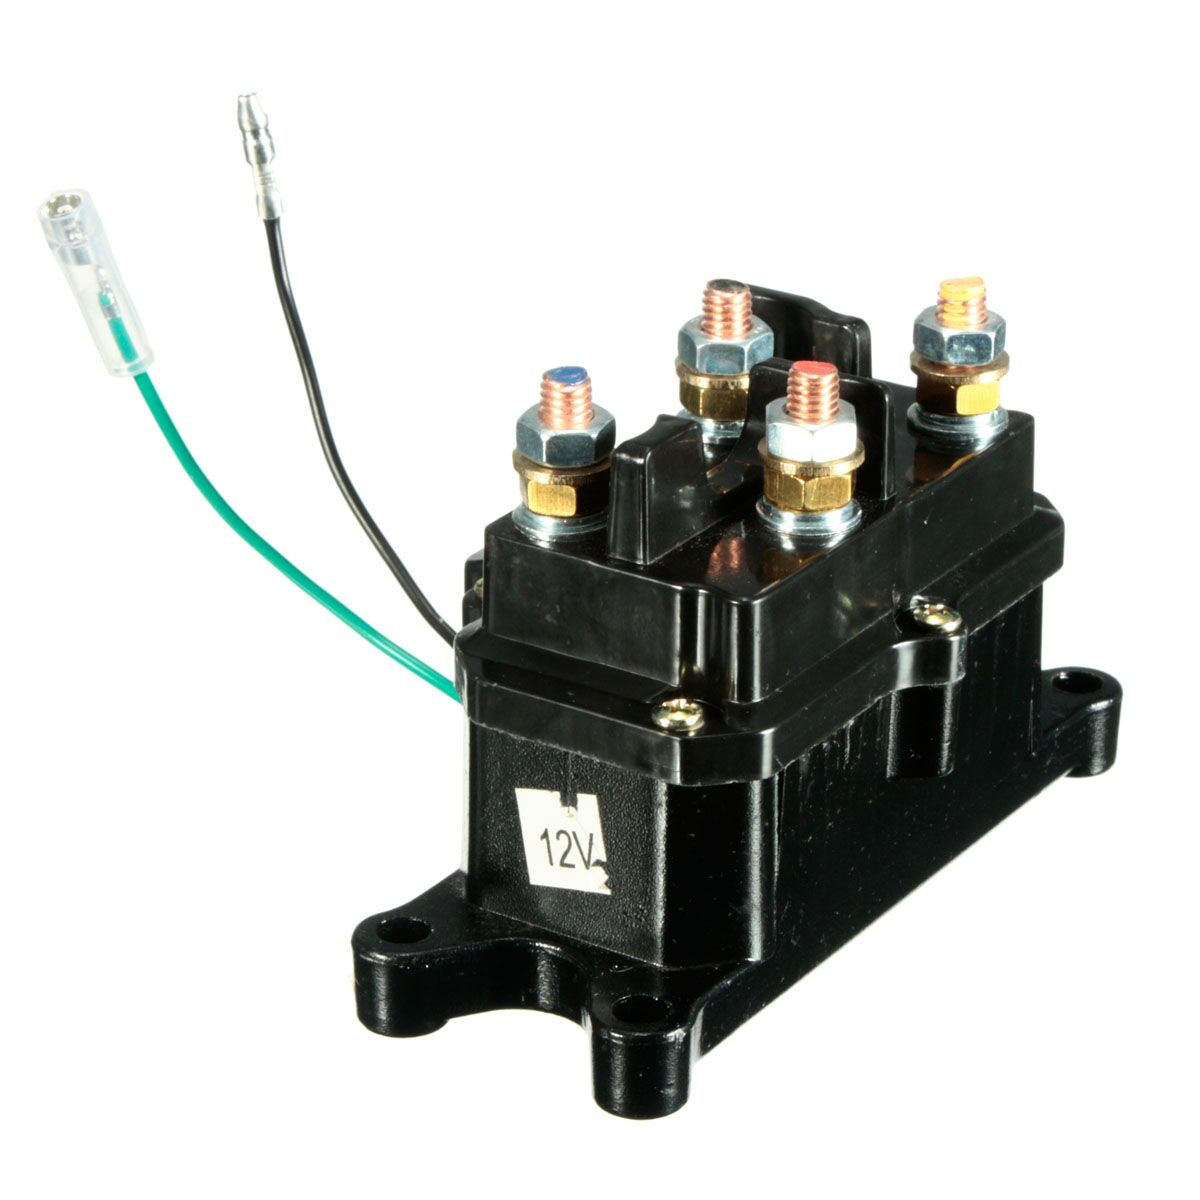 hight resolution of universal 12v solenoid relay contactor winch rocker switch thumb for atv utv practical 1 set